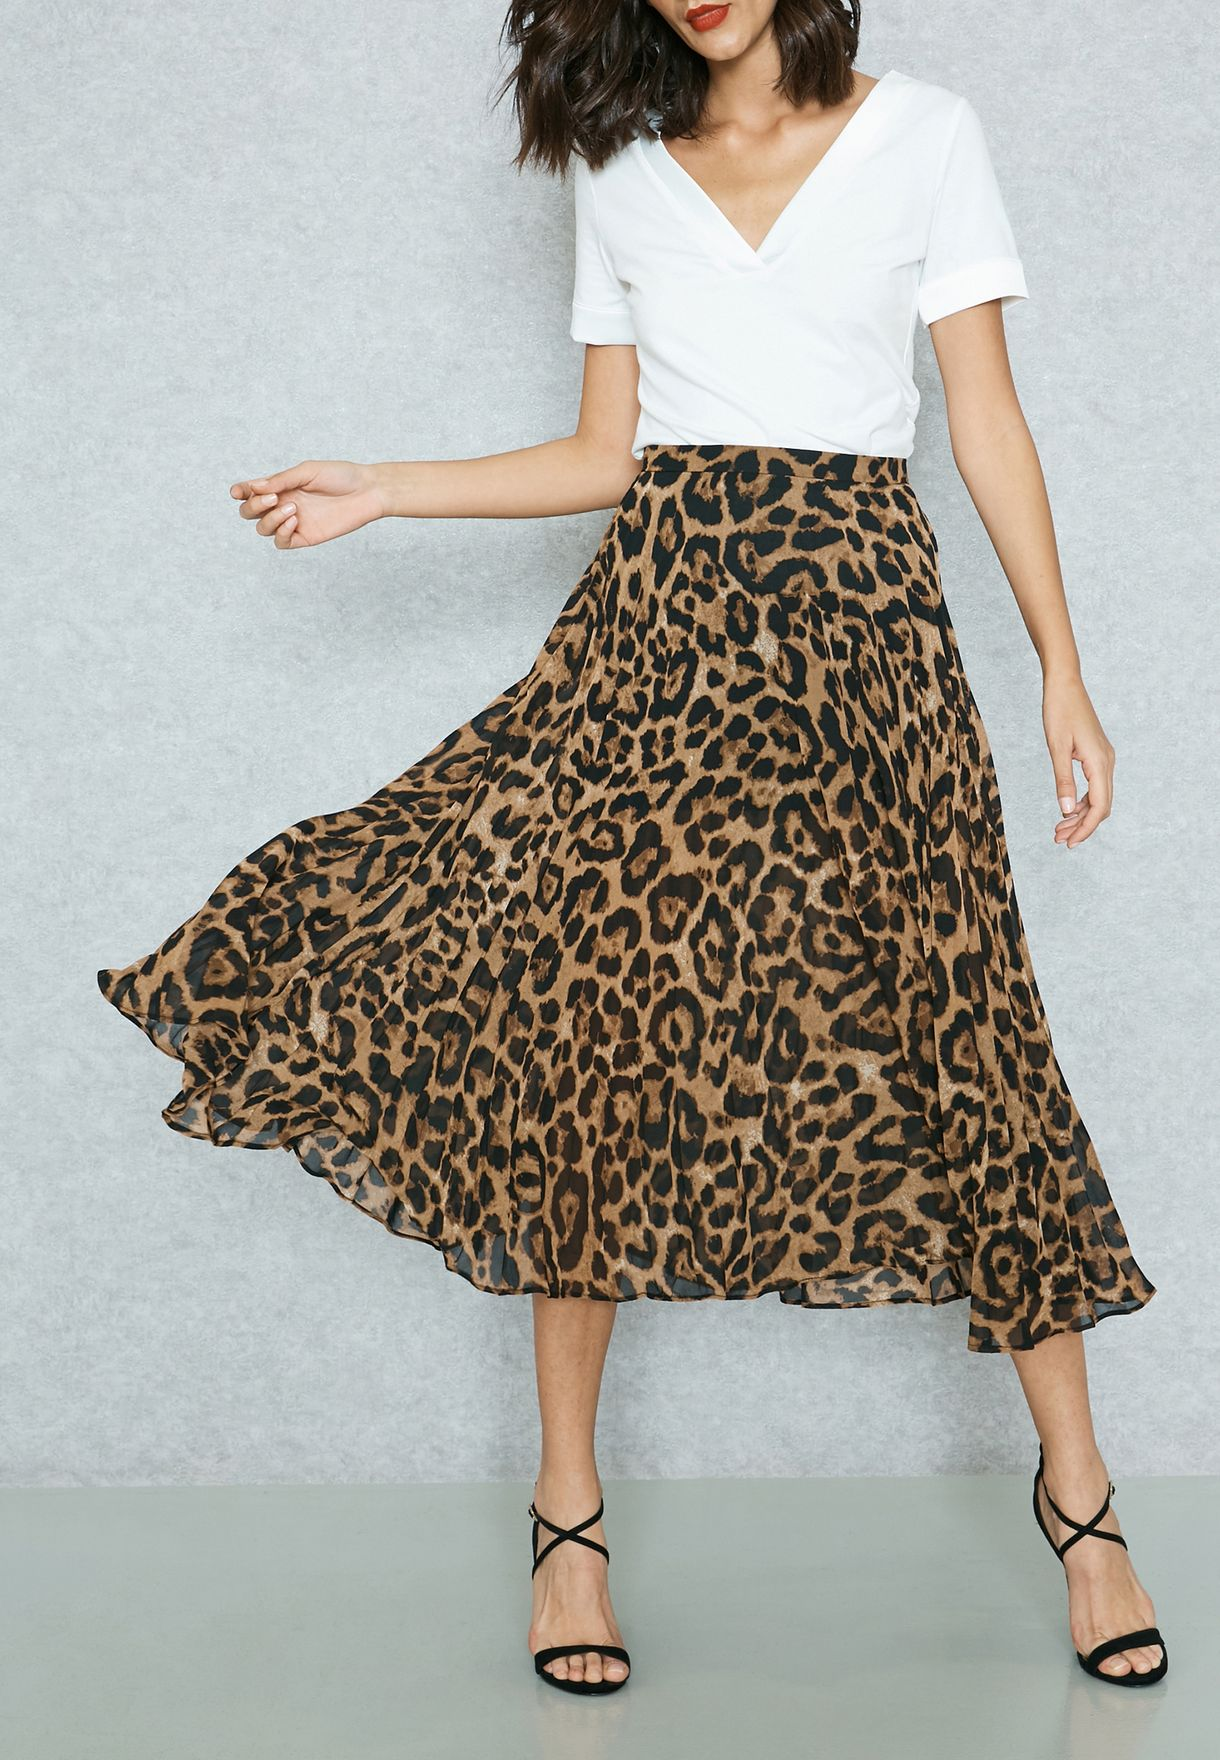 be859f82e تسوق تنورة ميدي بطبعة نمر ماركة باردو لون طبعات الحيوانات 38325SB في ...